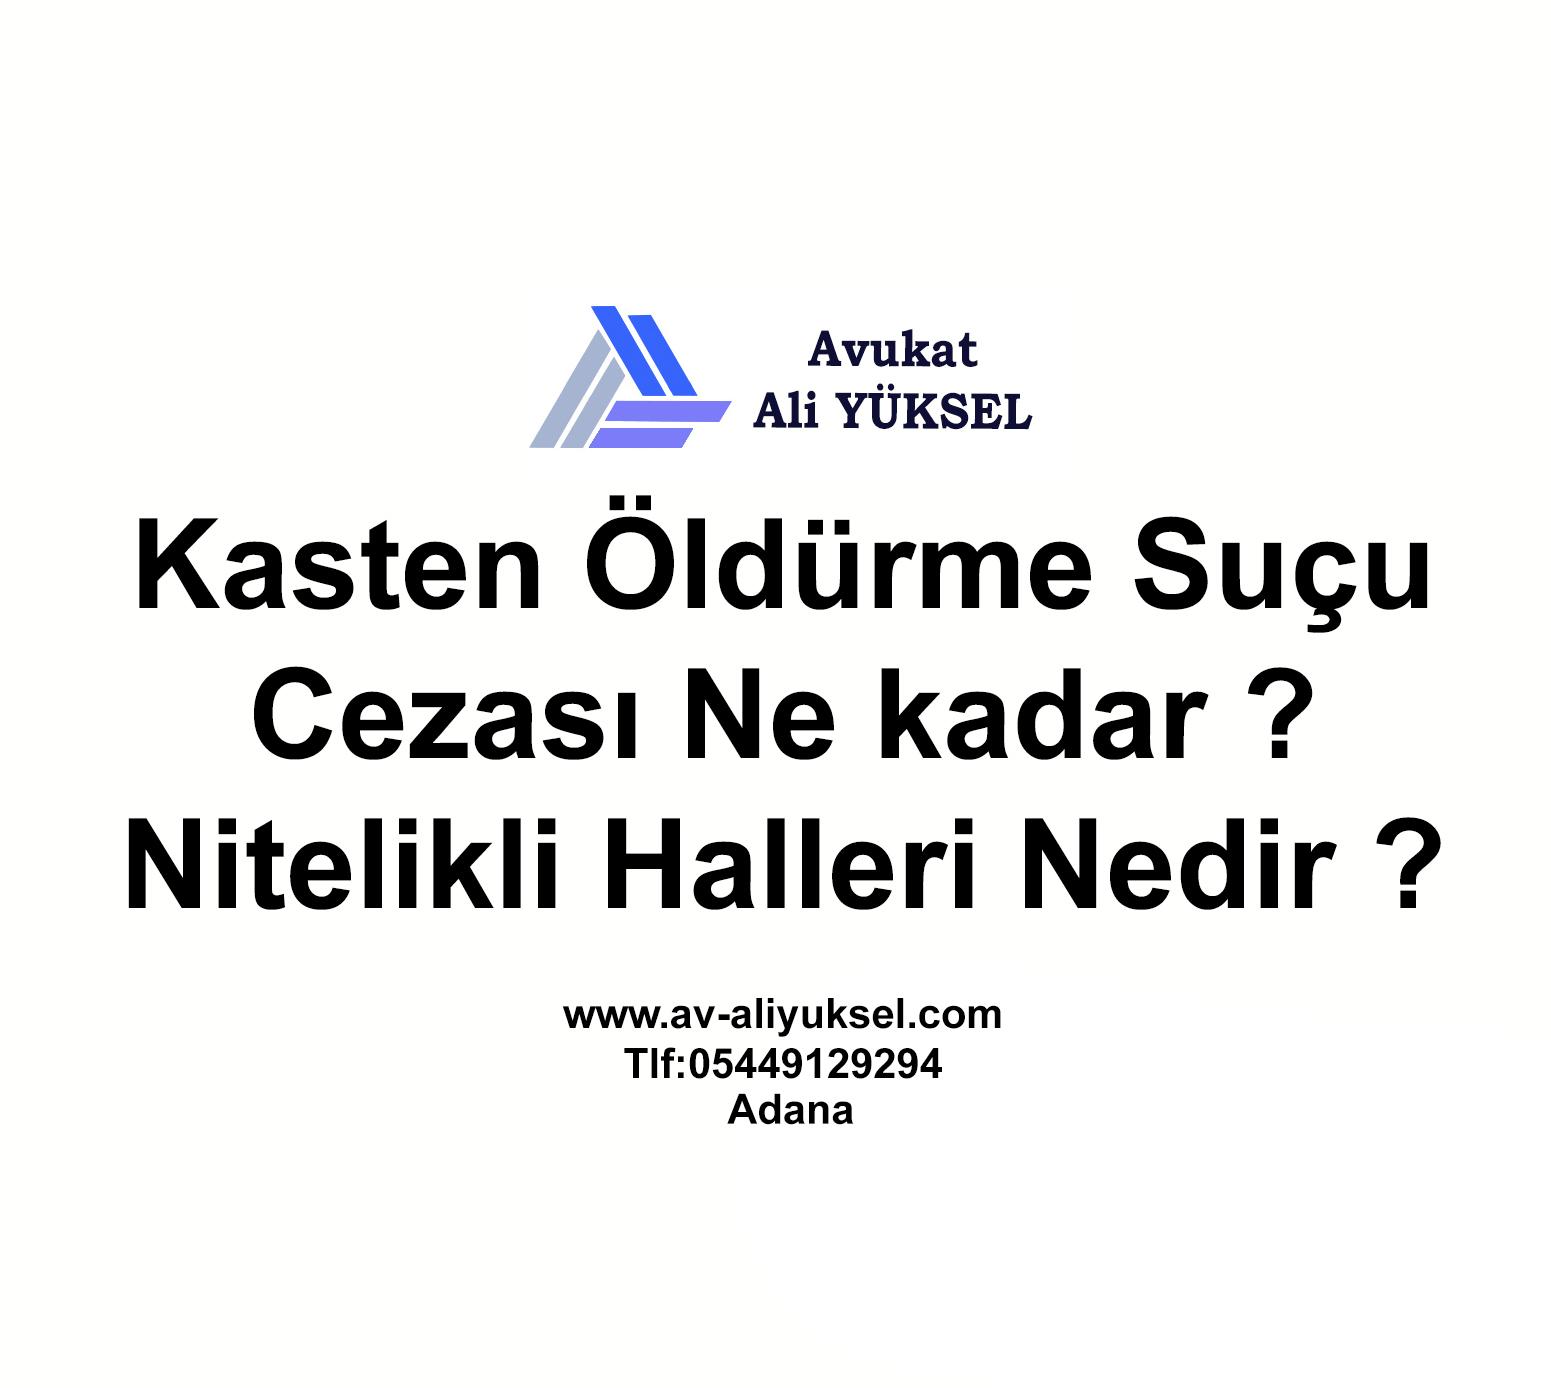 Kasten Adam Oldurme Sucu Nedir Avukat Ali Yuksel Ii Adana Ceza Avukati Adana Bosanma Avukati Adana Aile Hukuku Ceza Hukuku